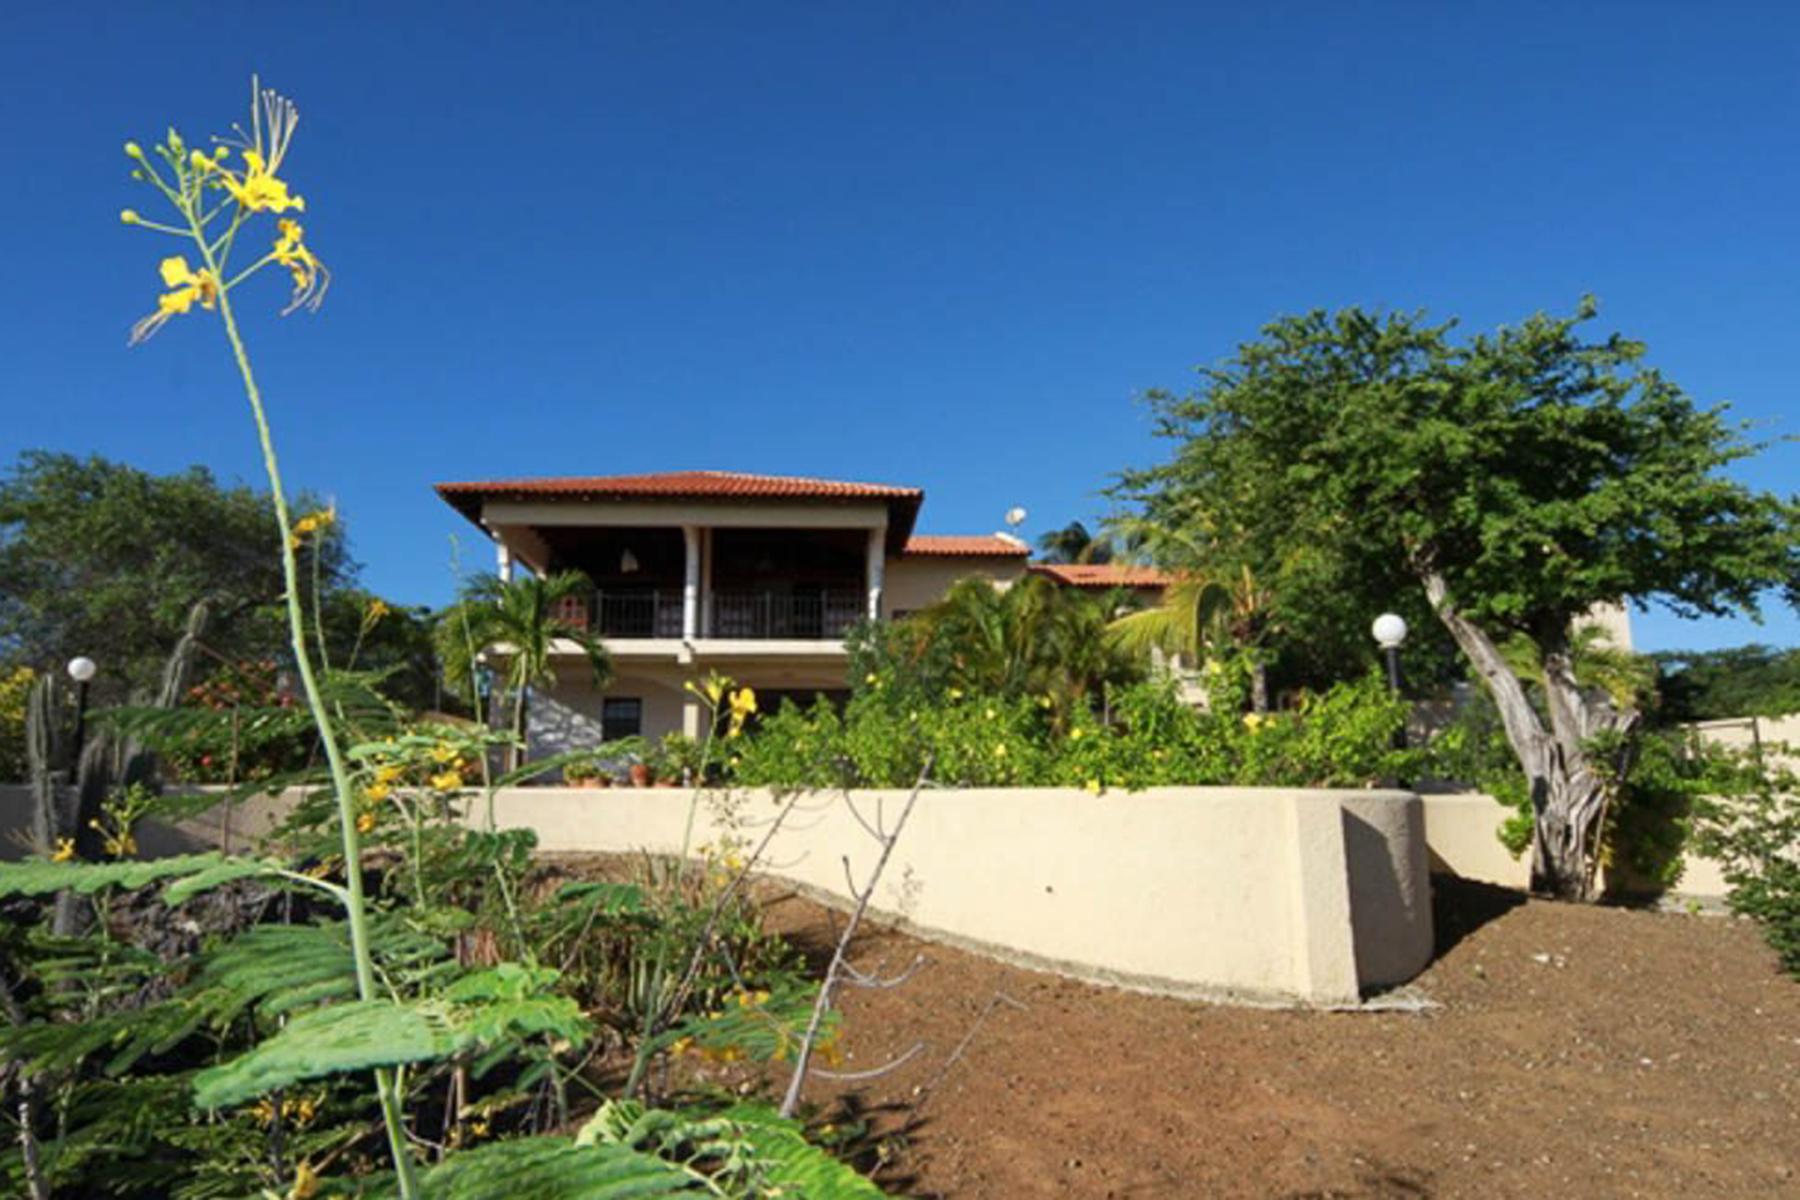 Single Family Home for Sale at Villa Turkesa Other Cities In Bonaire, Cities In Bonaire Bonaire